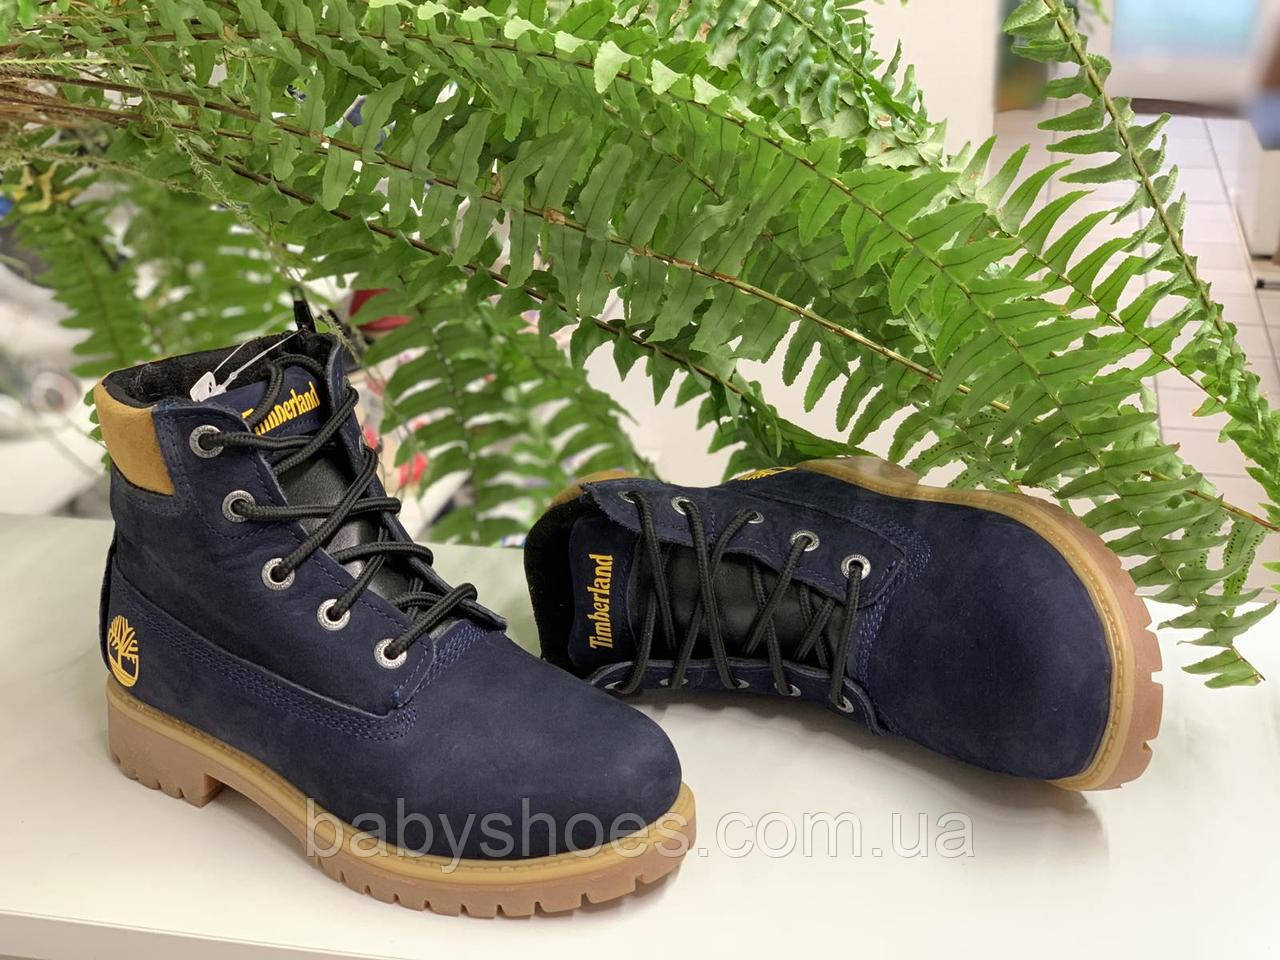 Зимние ботинки Timberland (реплика), замша,р.33, ХЗ-2